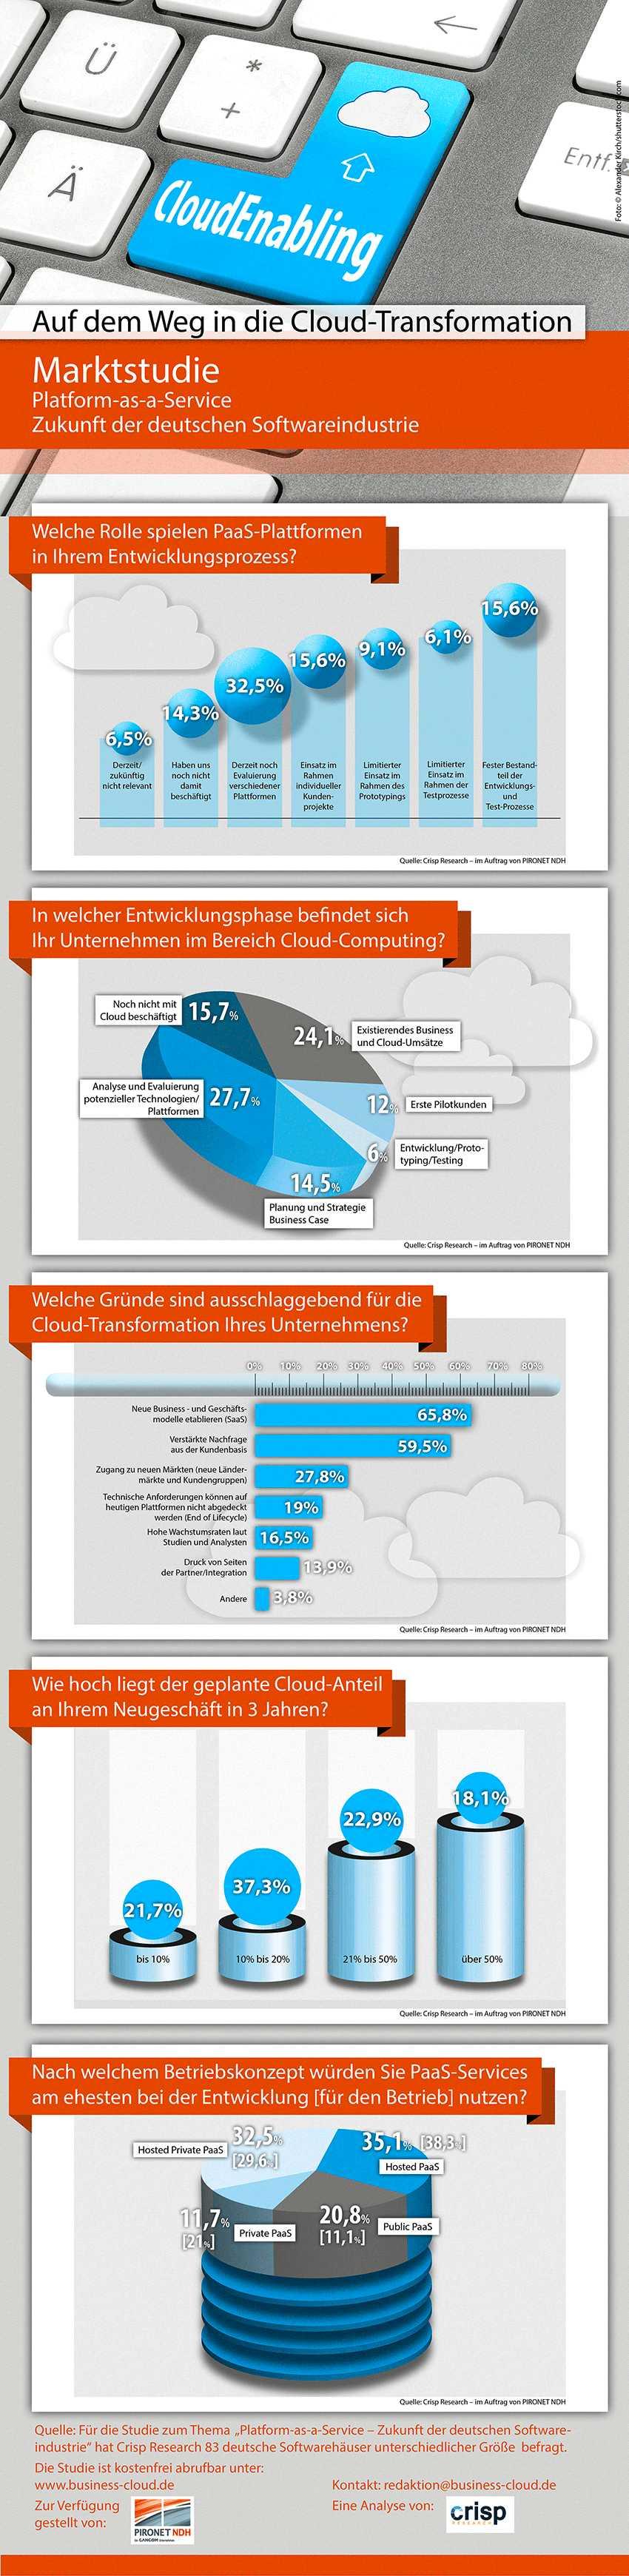 infografik Crisp_PaaS_Cloud-Transformation